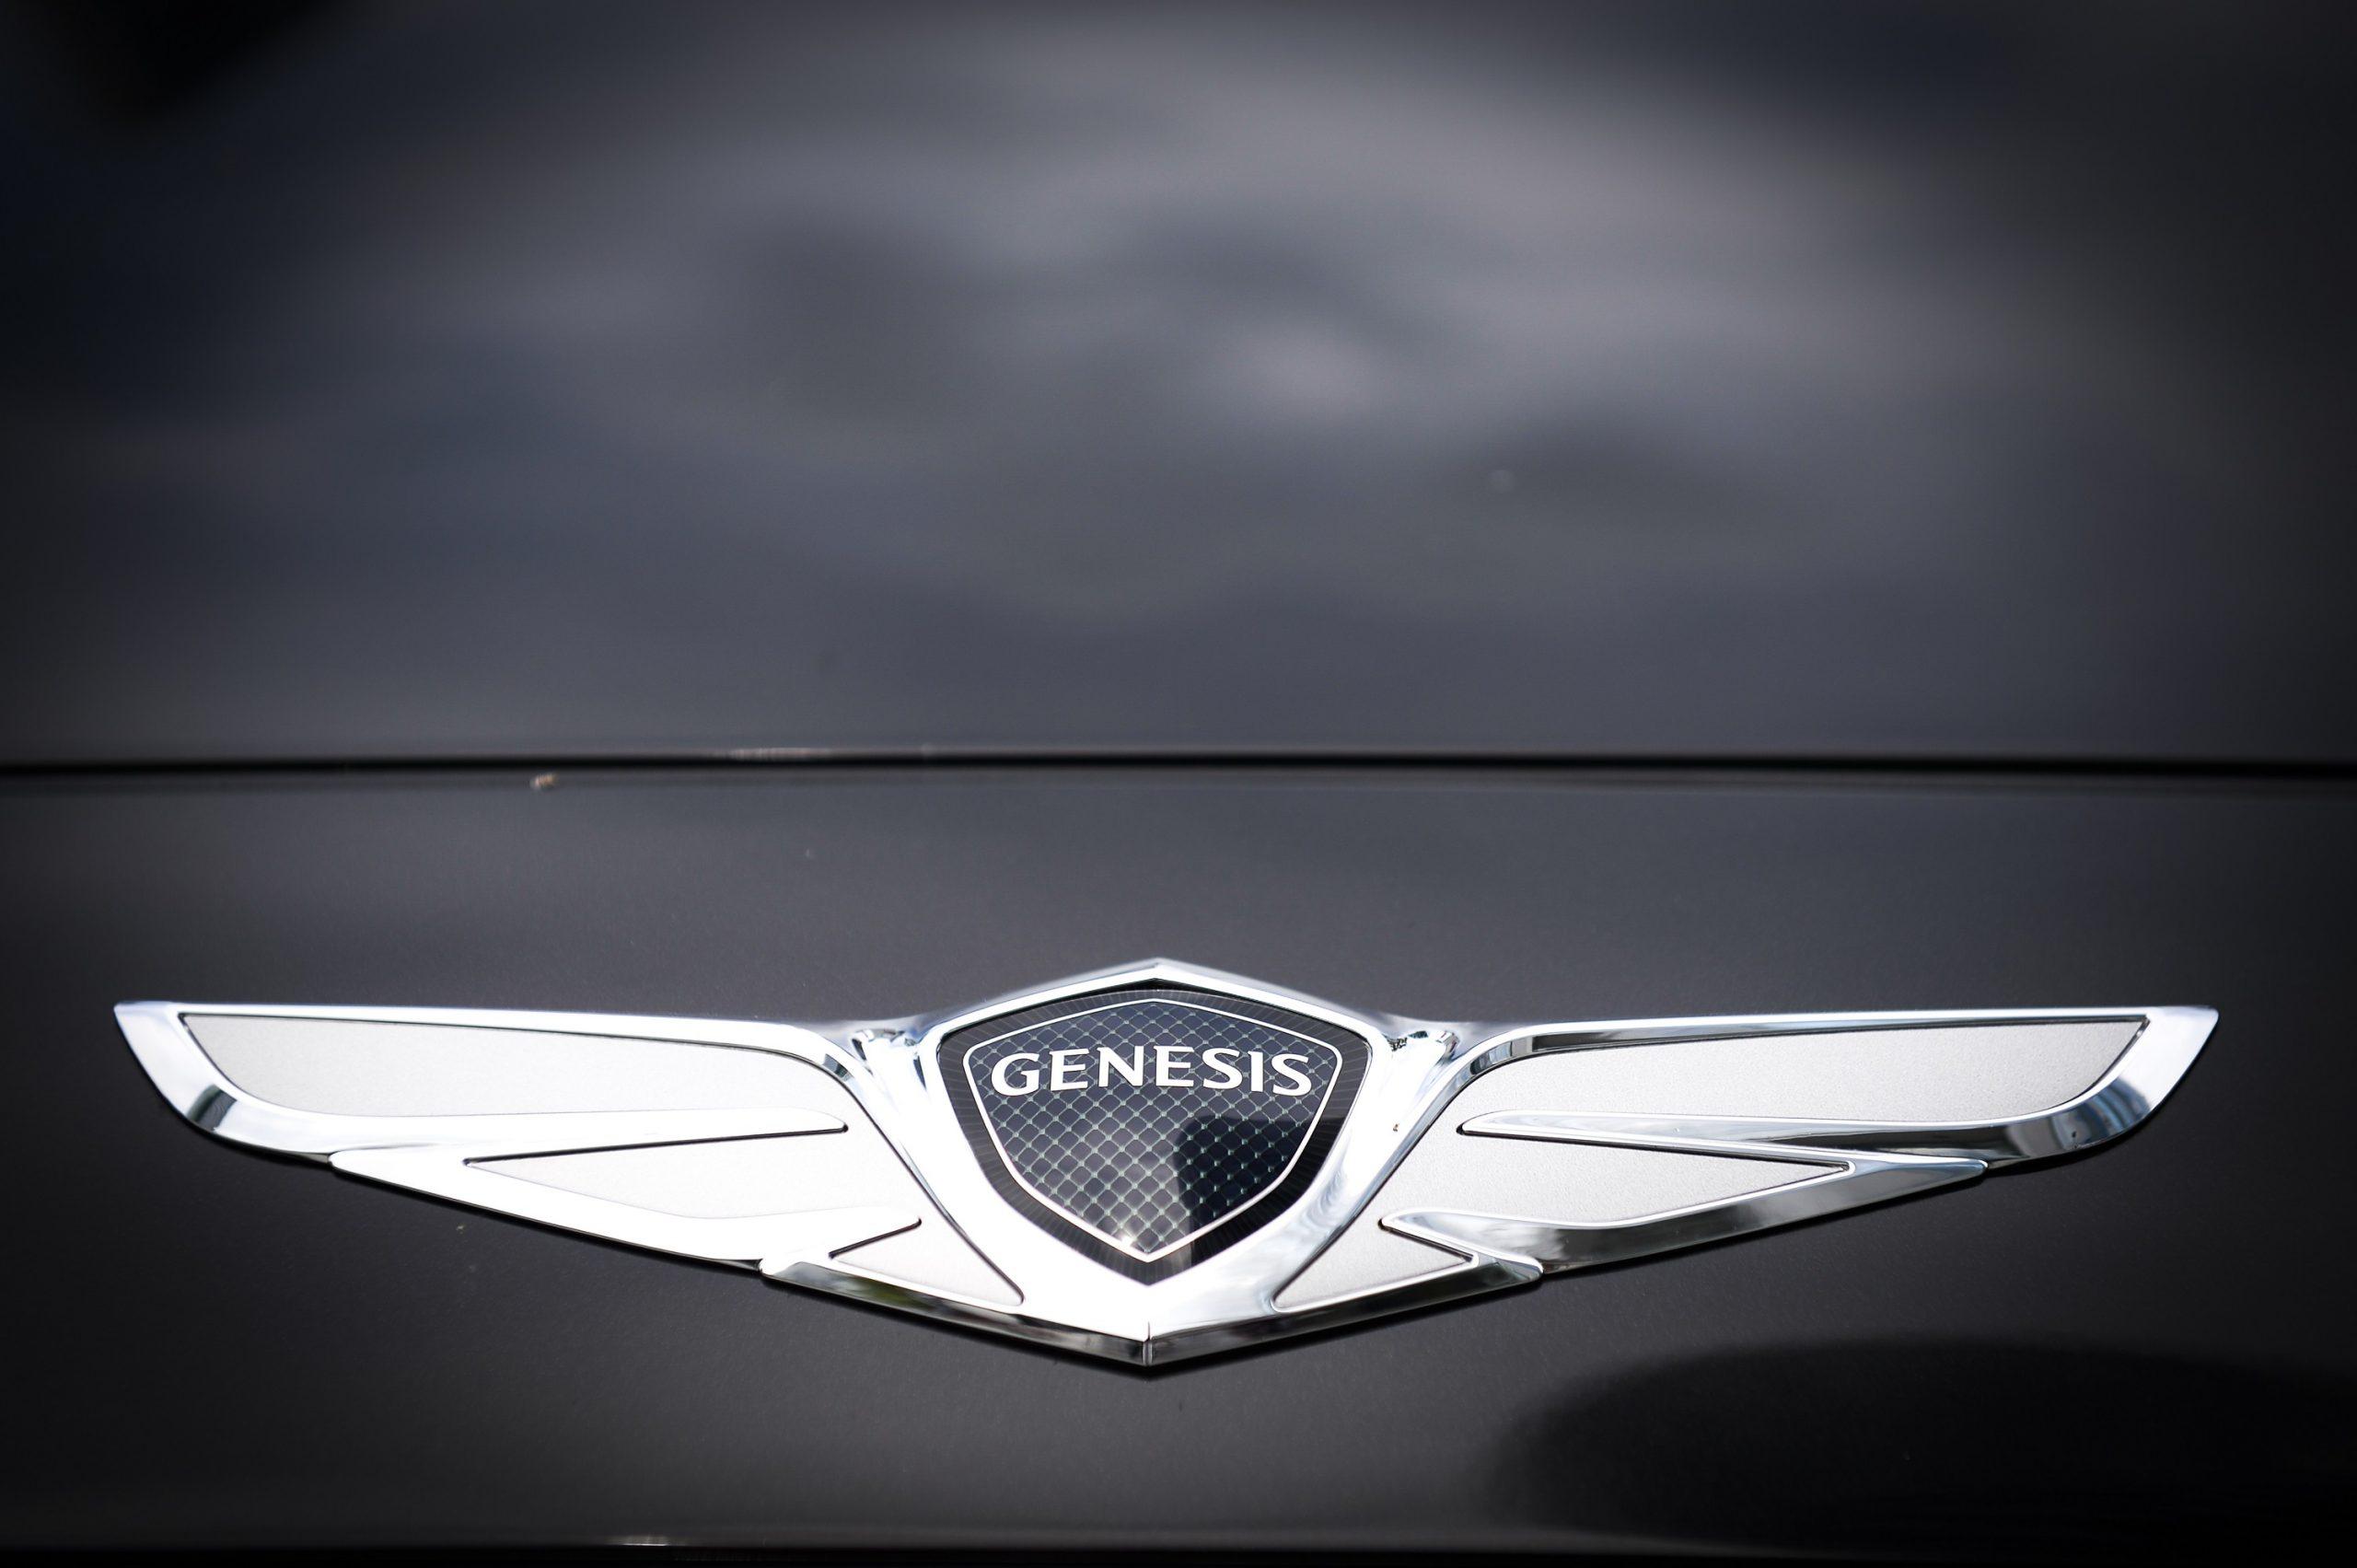 The winged Genesis logo